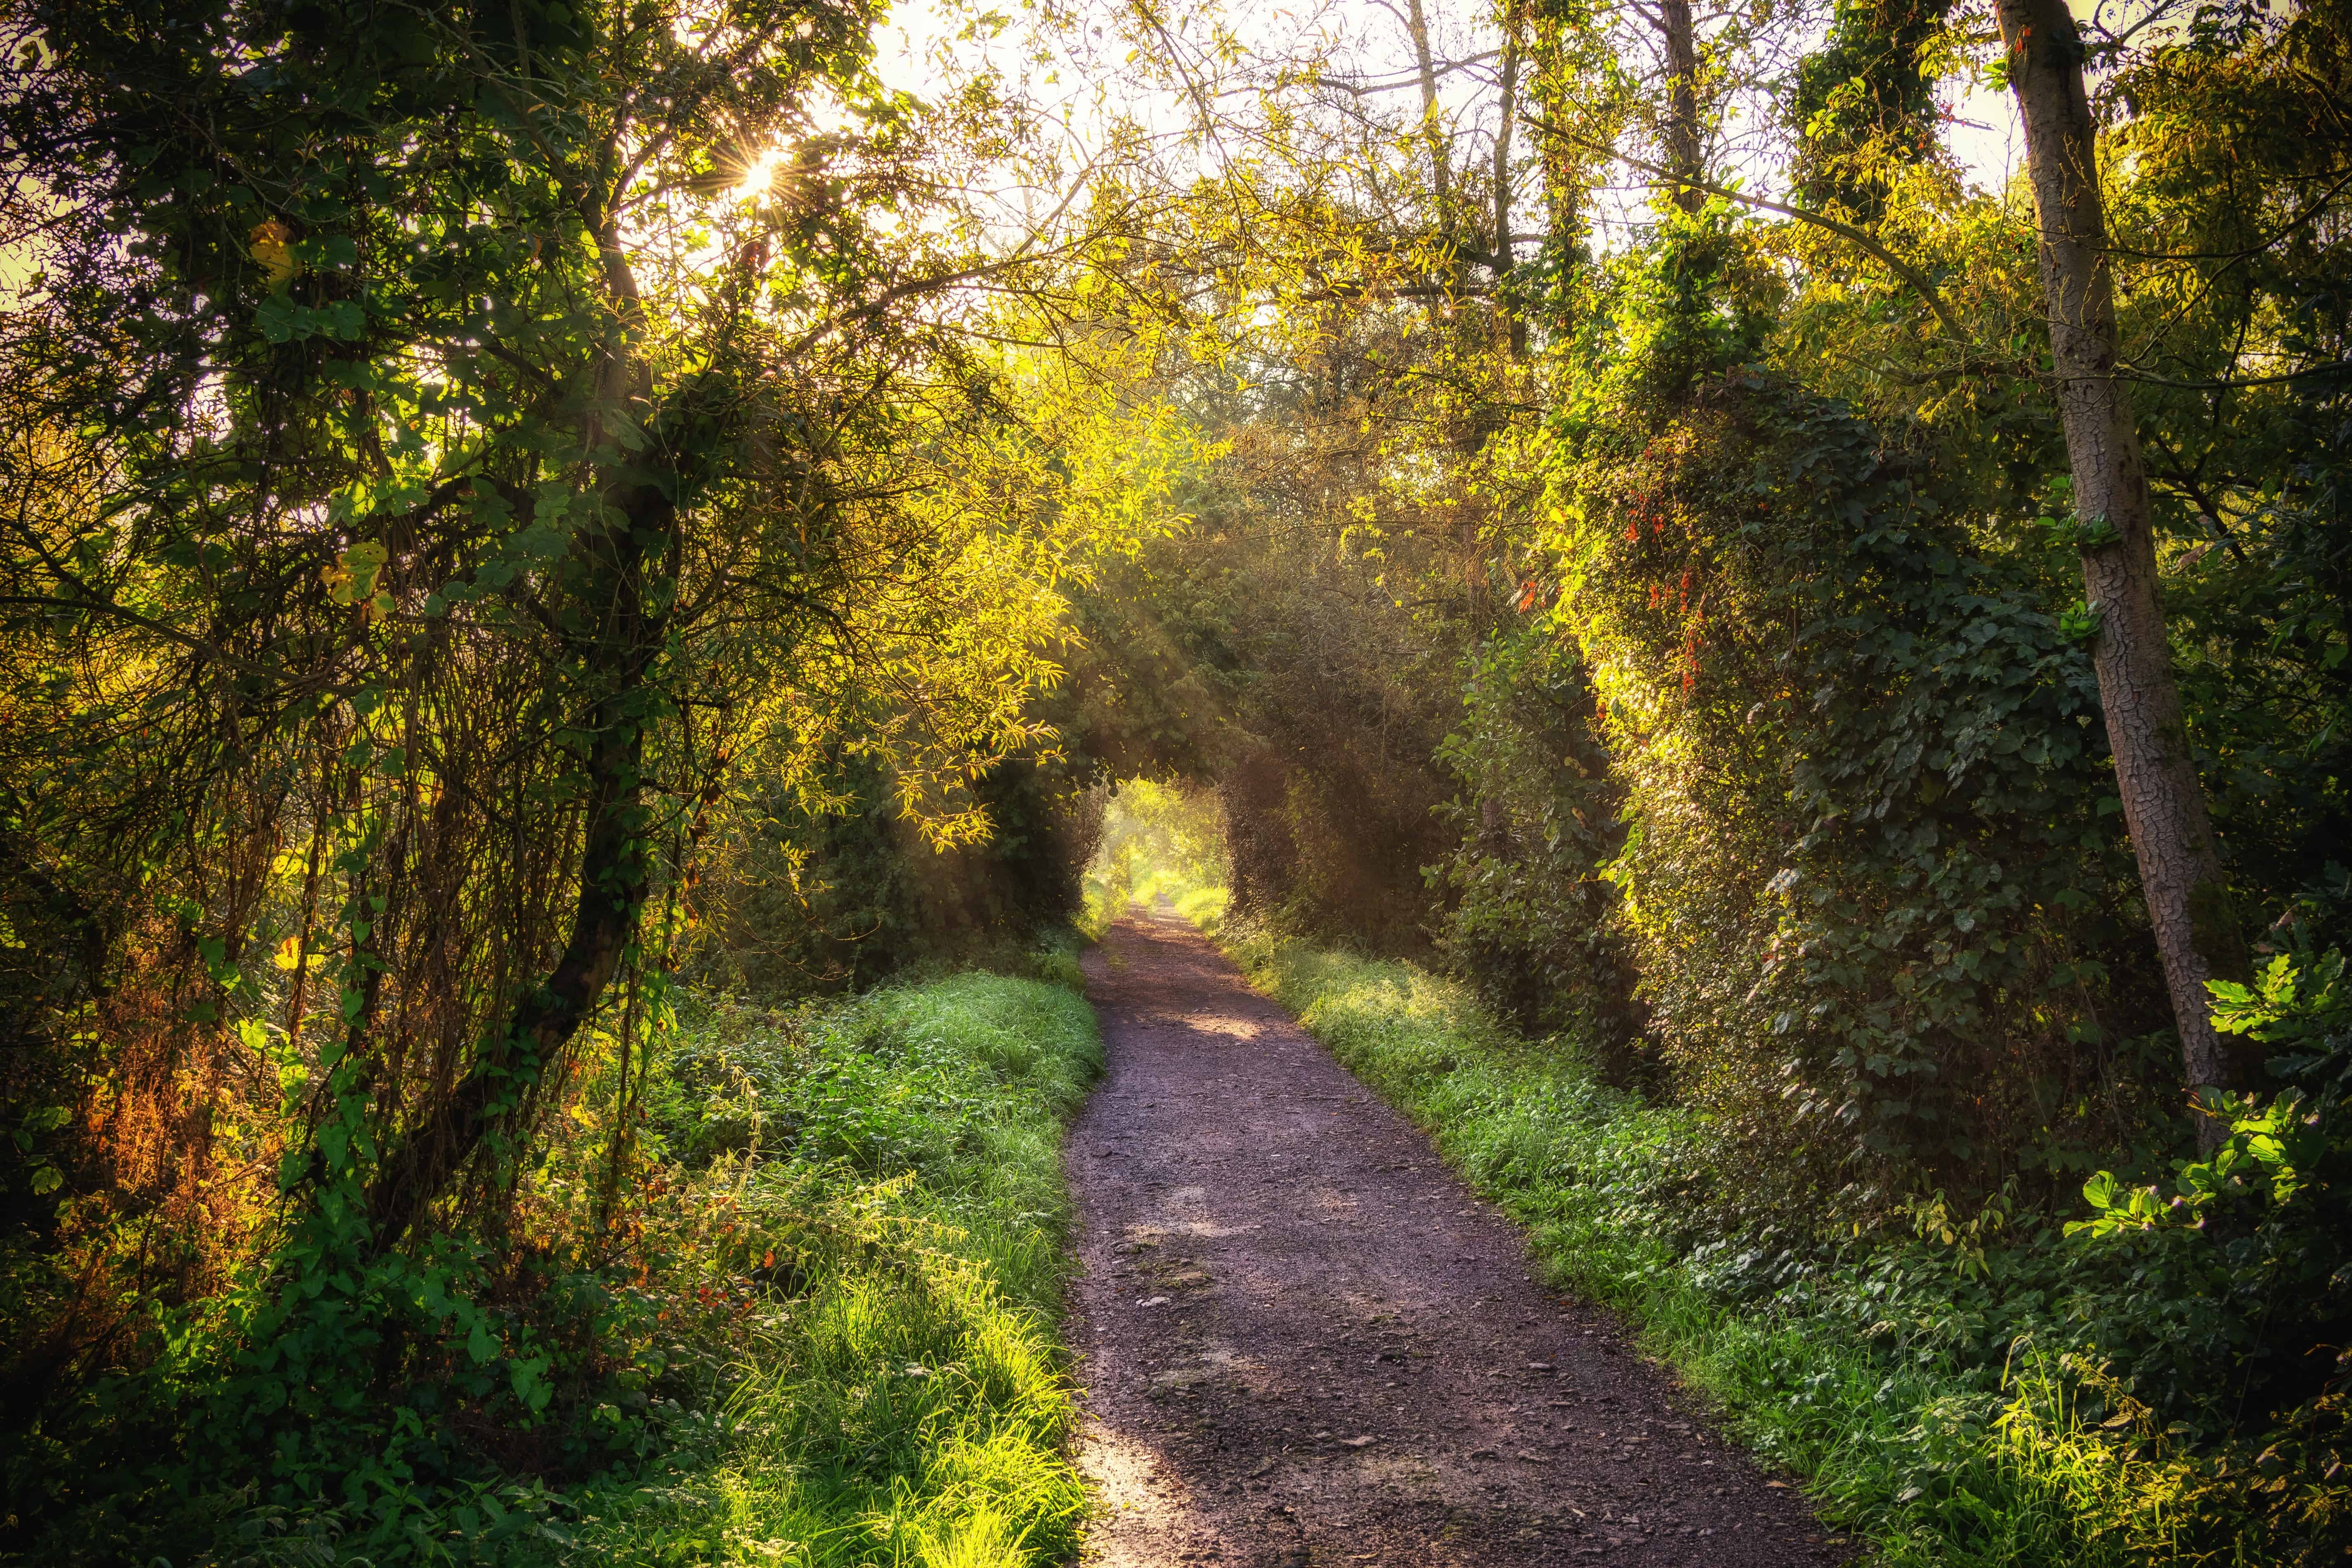 Free Picture: Nature, Road, Wood, Leaf, Tree, Landscape